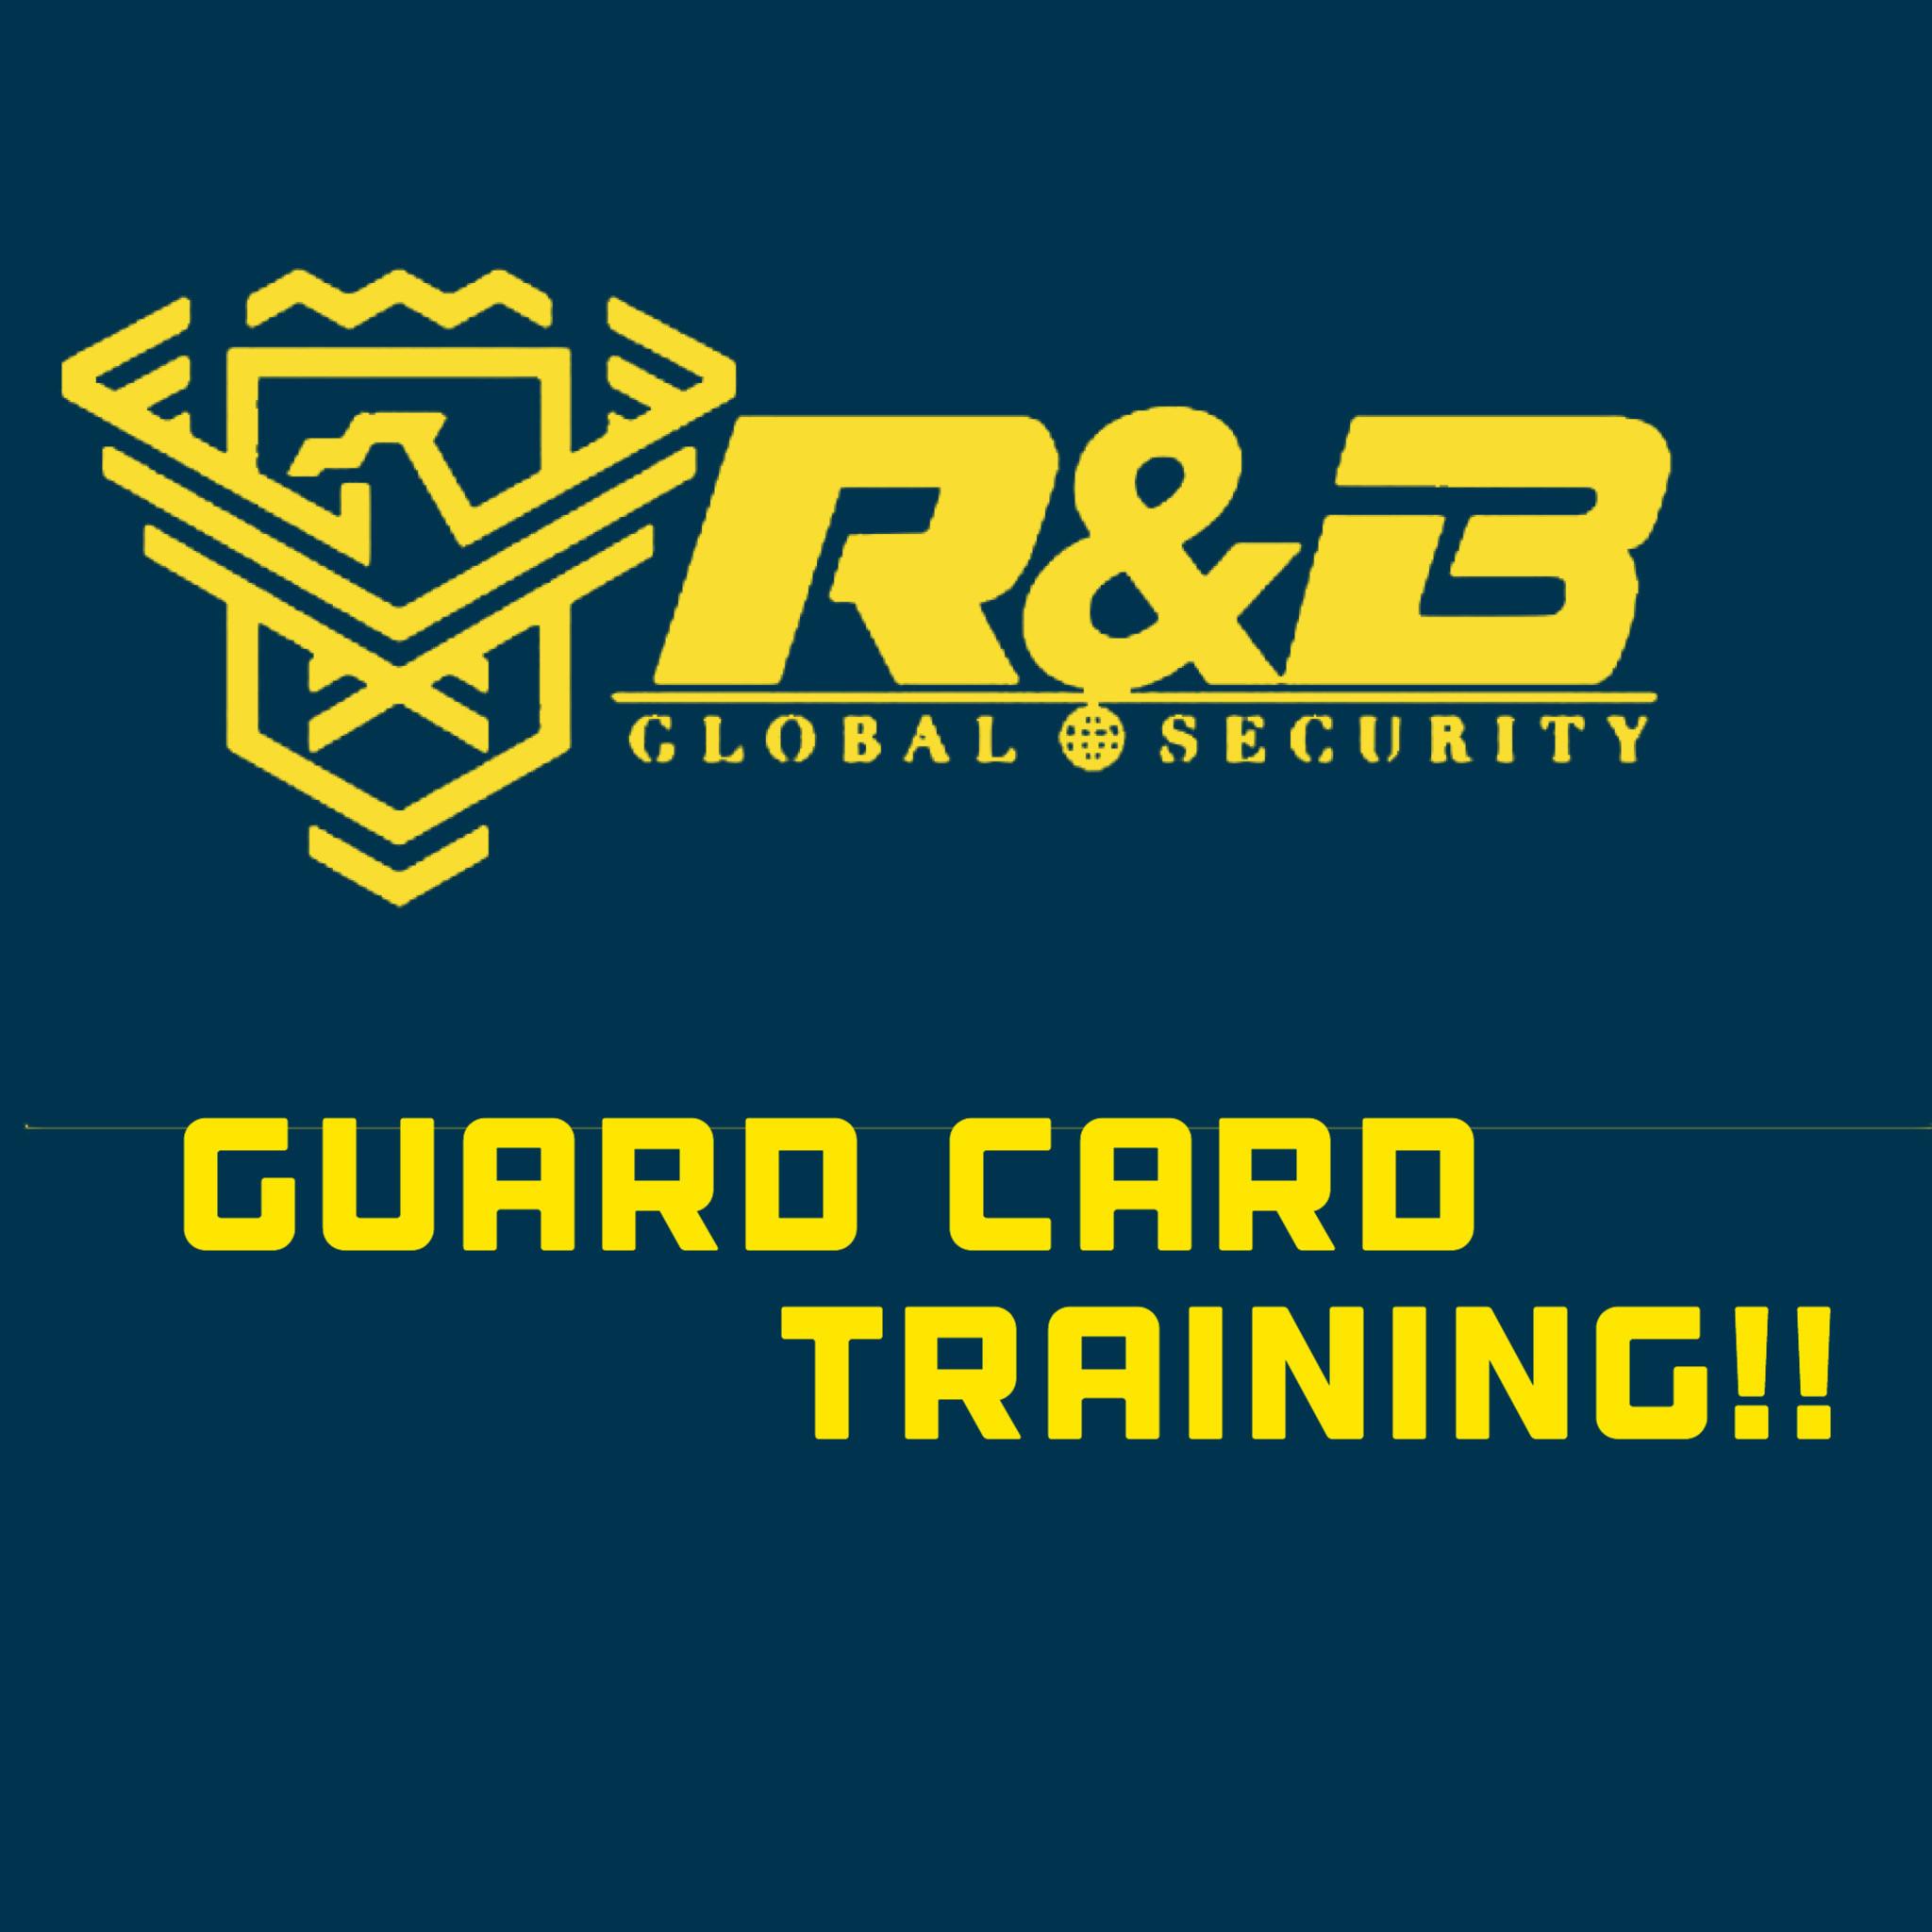 Guard Card Training